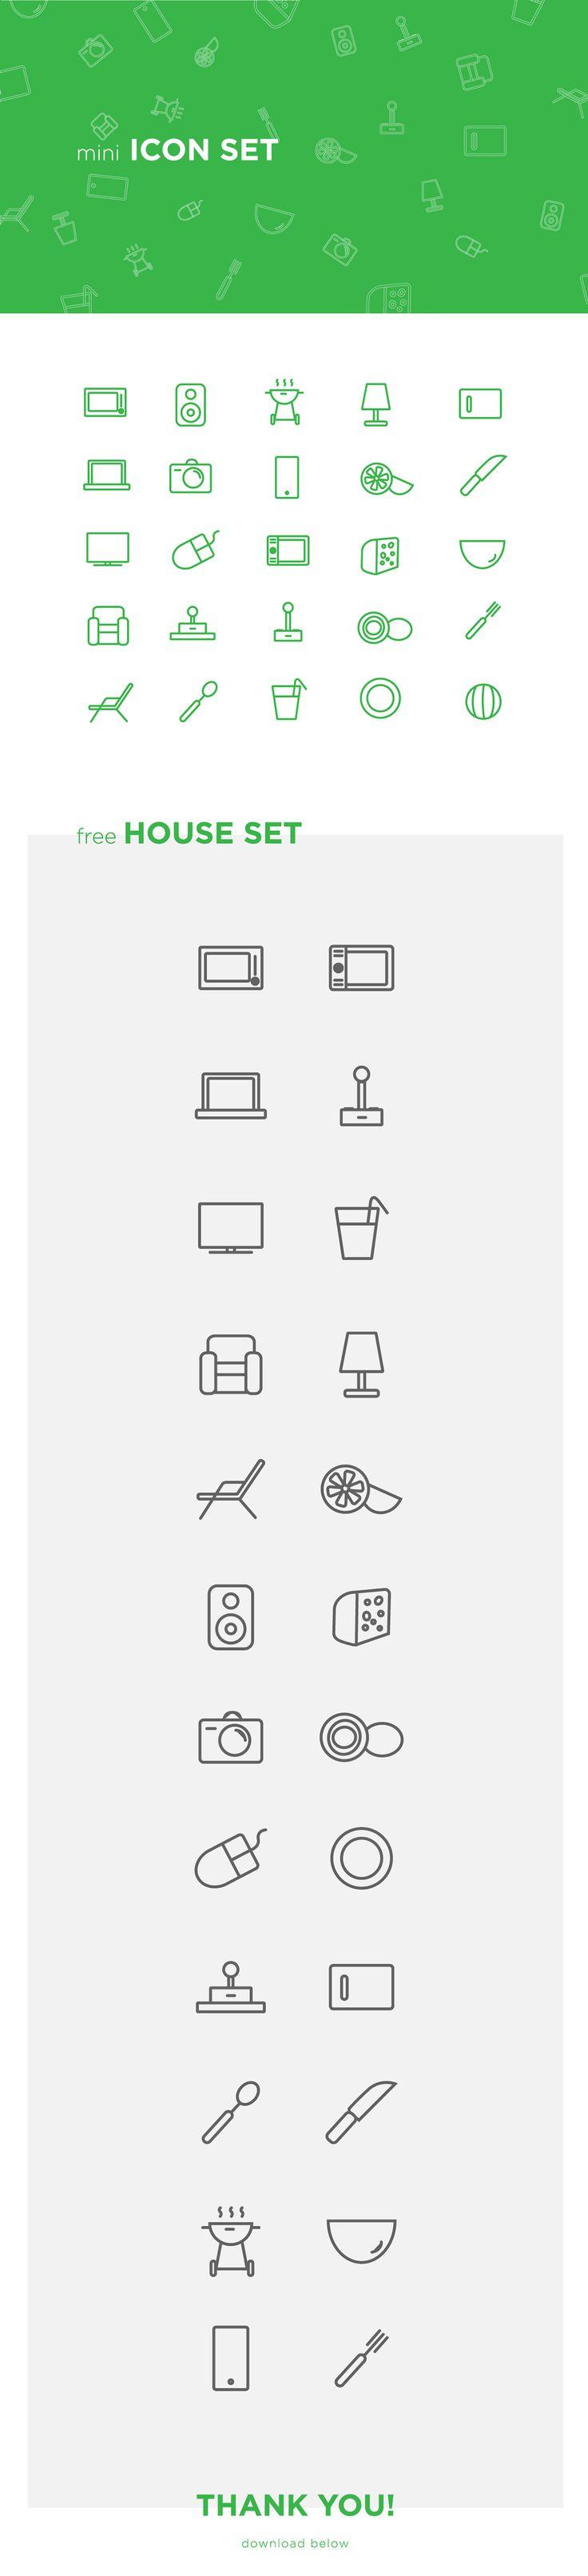 Web design inspiration UI/UX user experience fashion concept Icons mini House Icon Set (free) on Behance